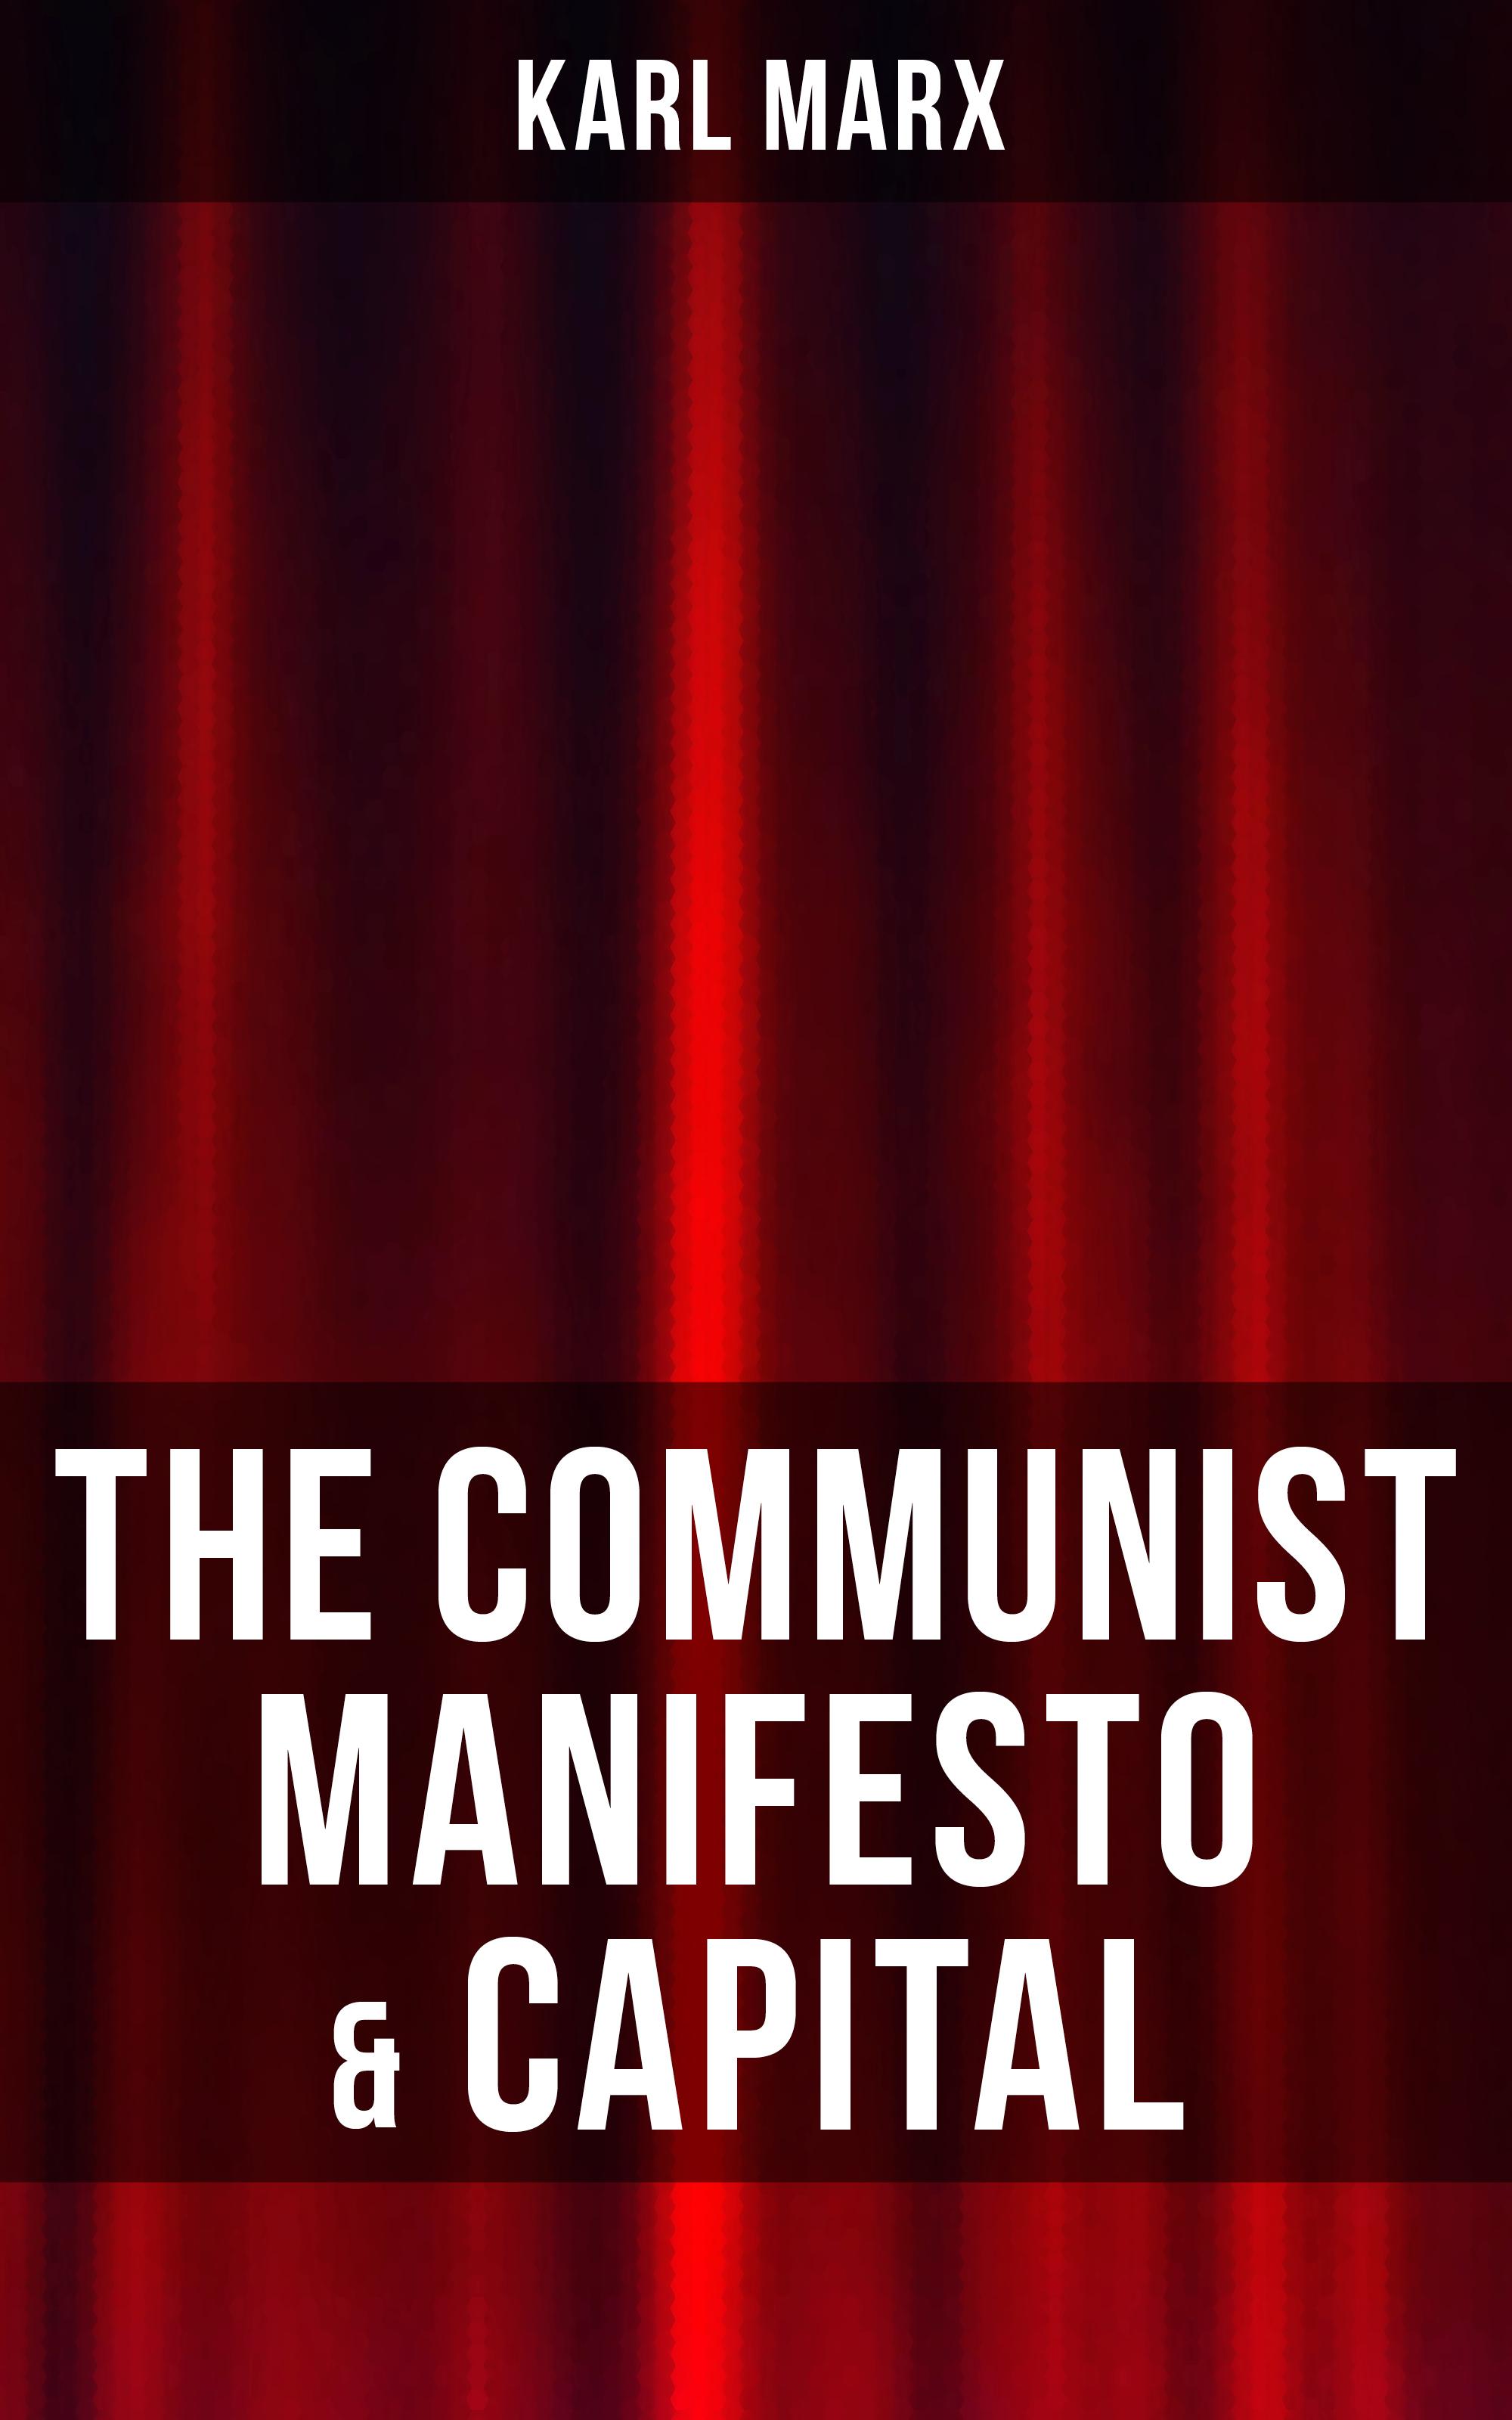 Karl Marx THE COMMUNIST MANIFESTO & CAPITAL the romantic manifesto